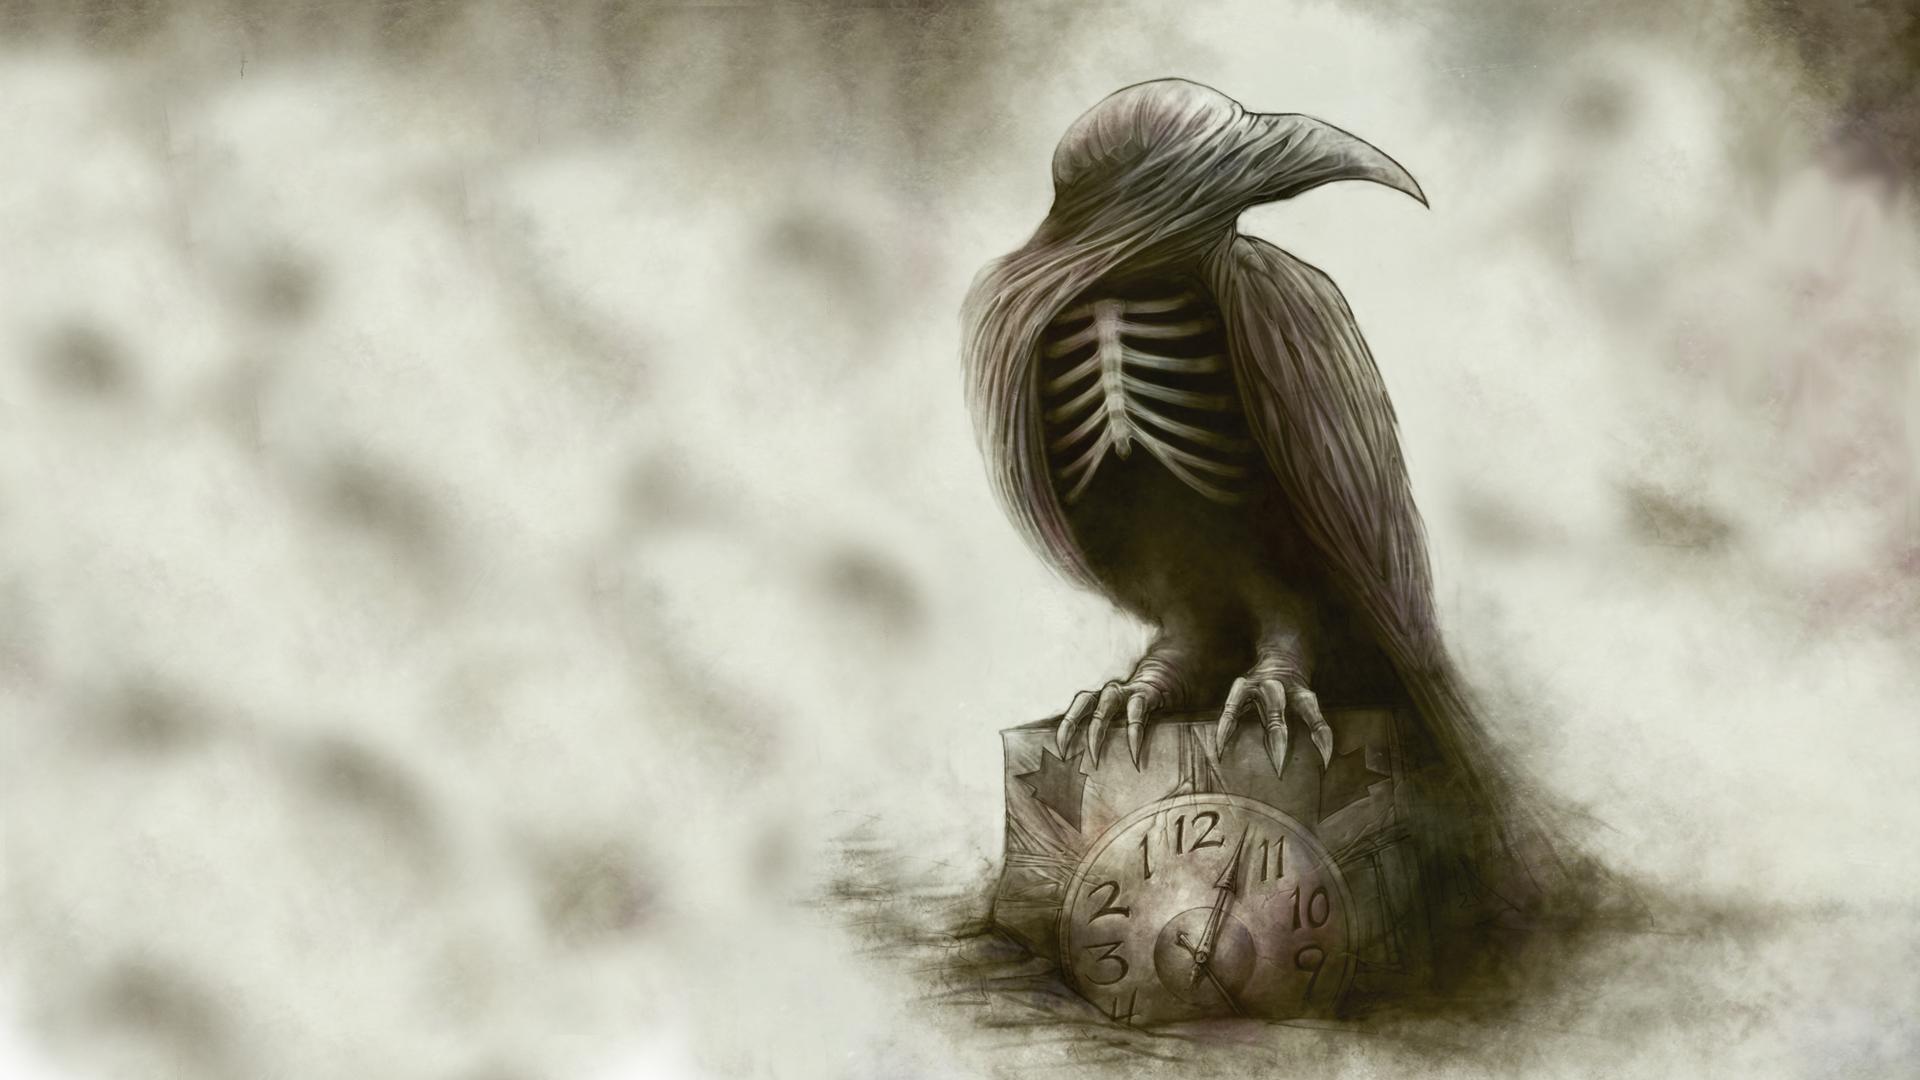 Drawn raven spooky Dark Skeleton wallpapers Clock poe